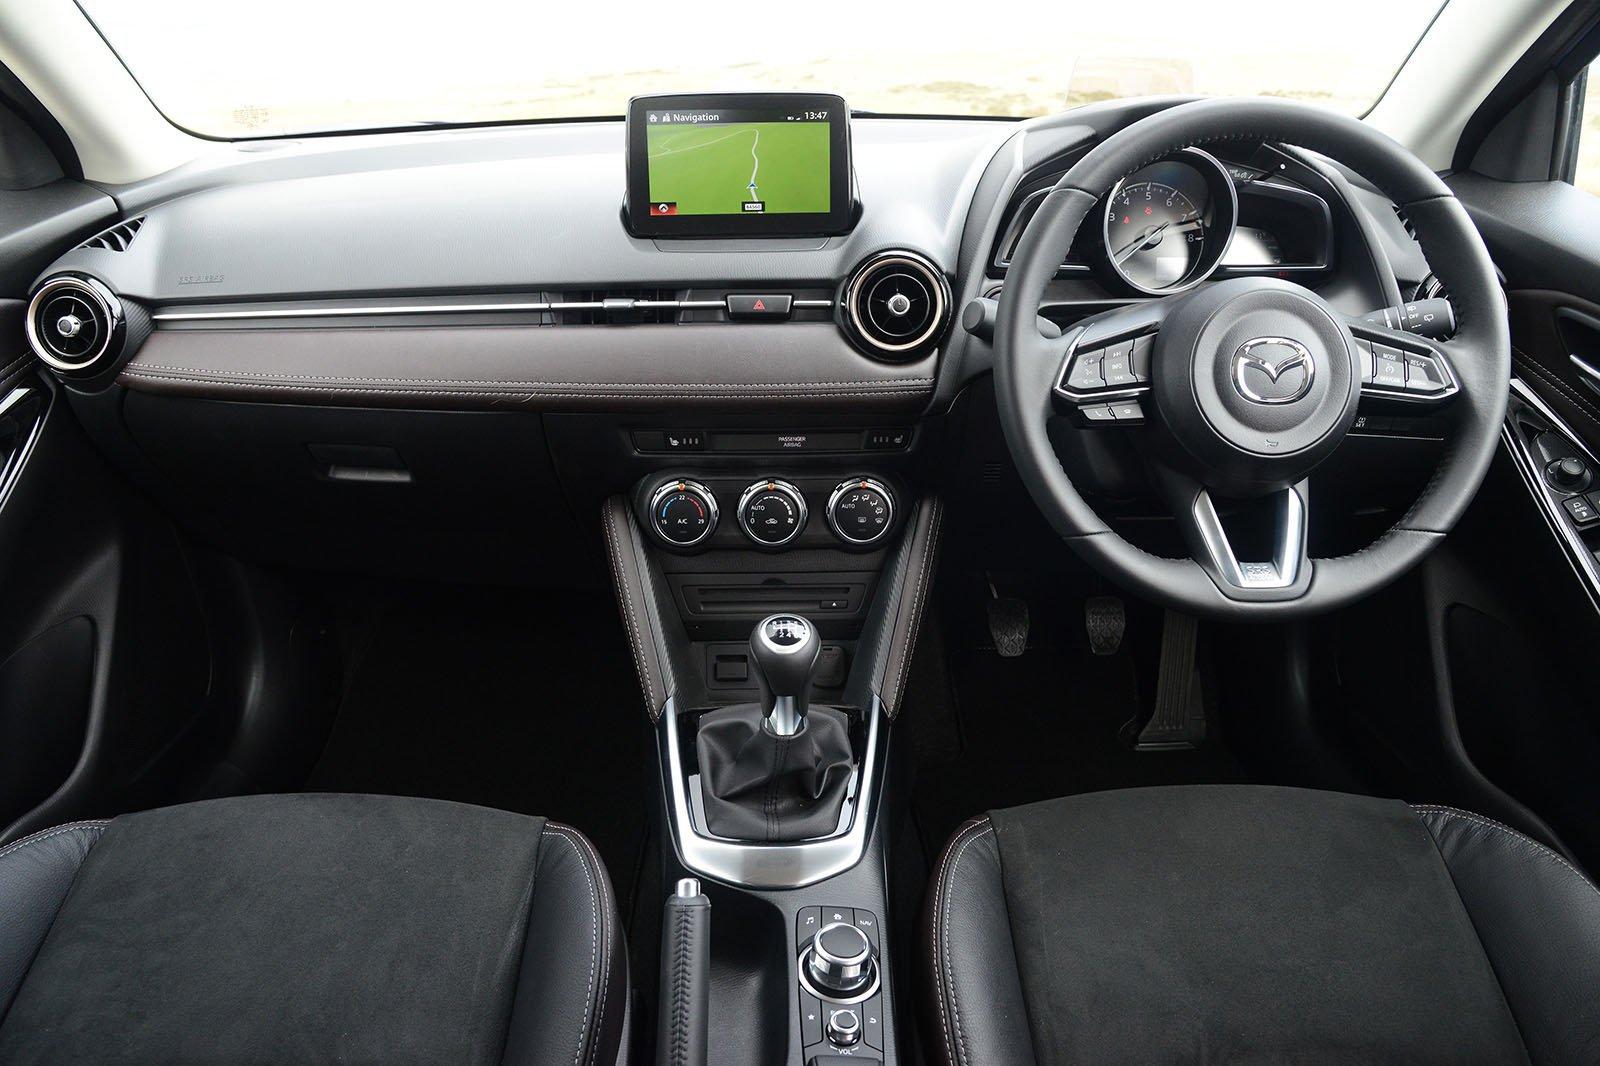 Mazda 2 1.5 75 SE+ - interior